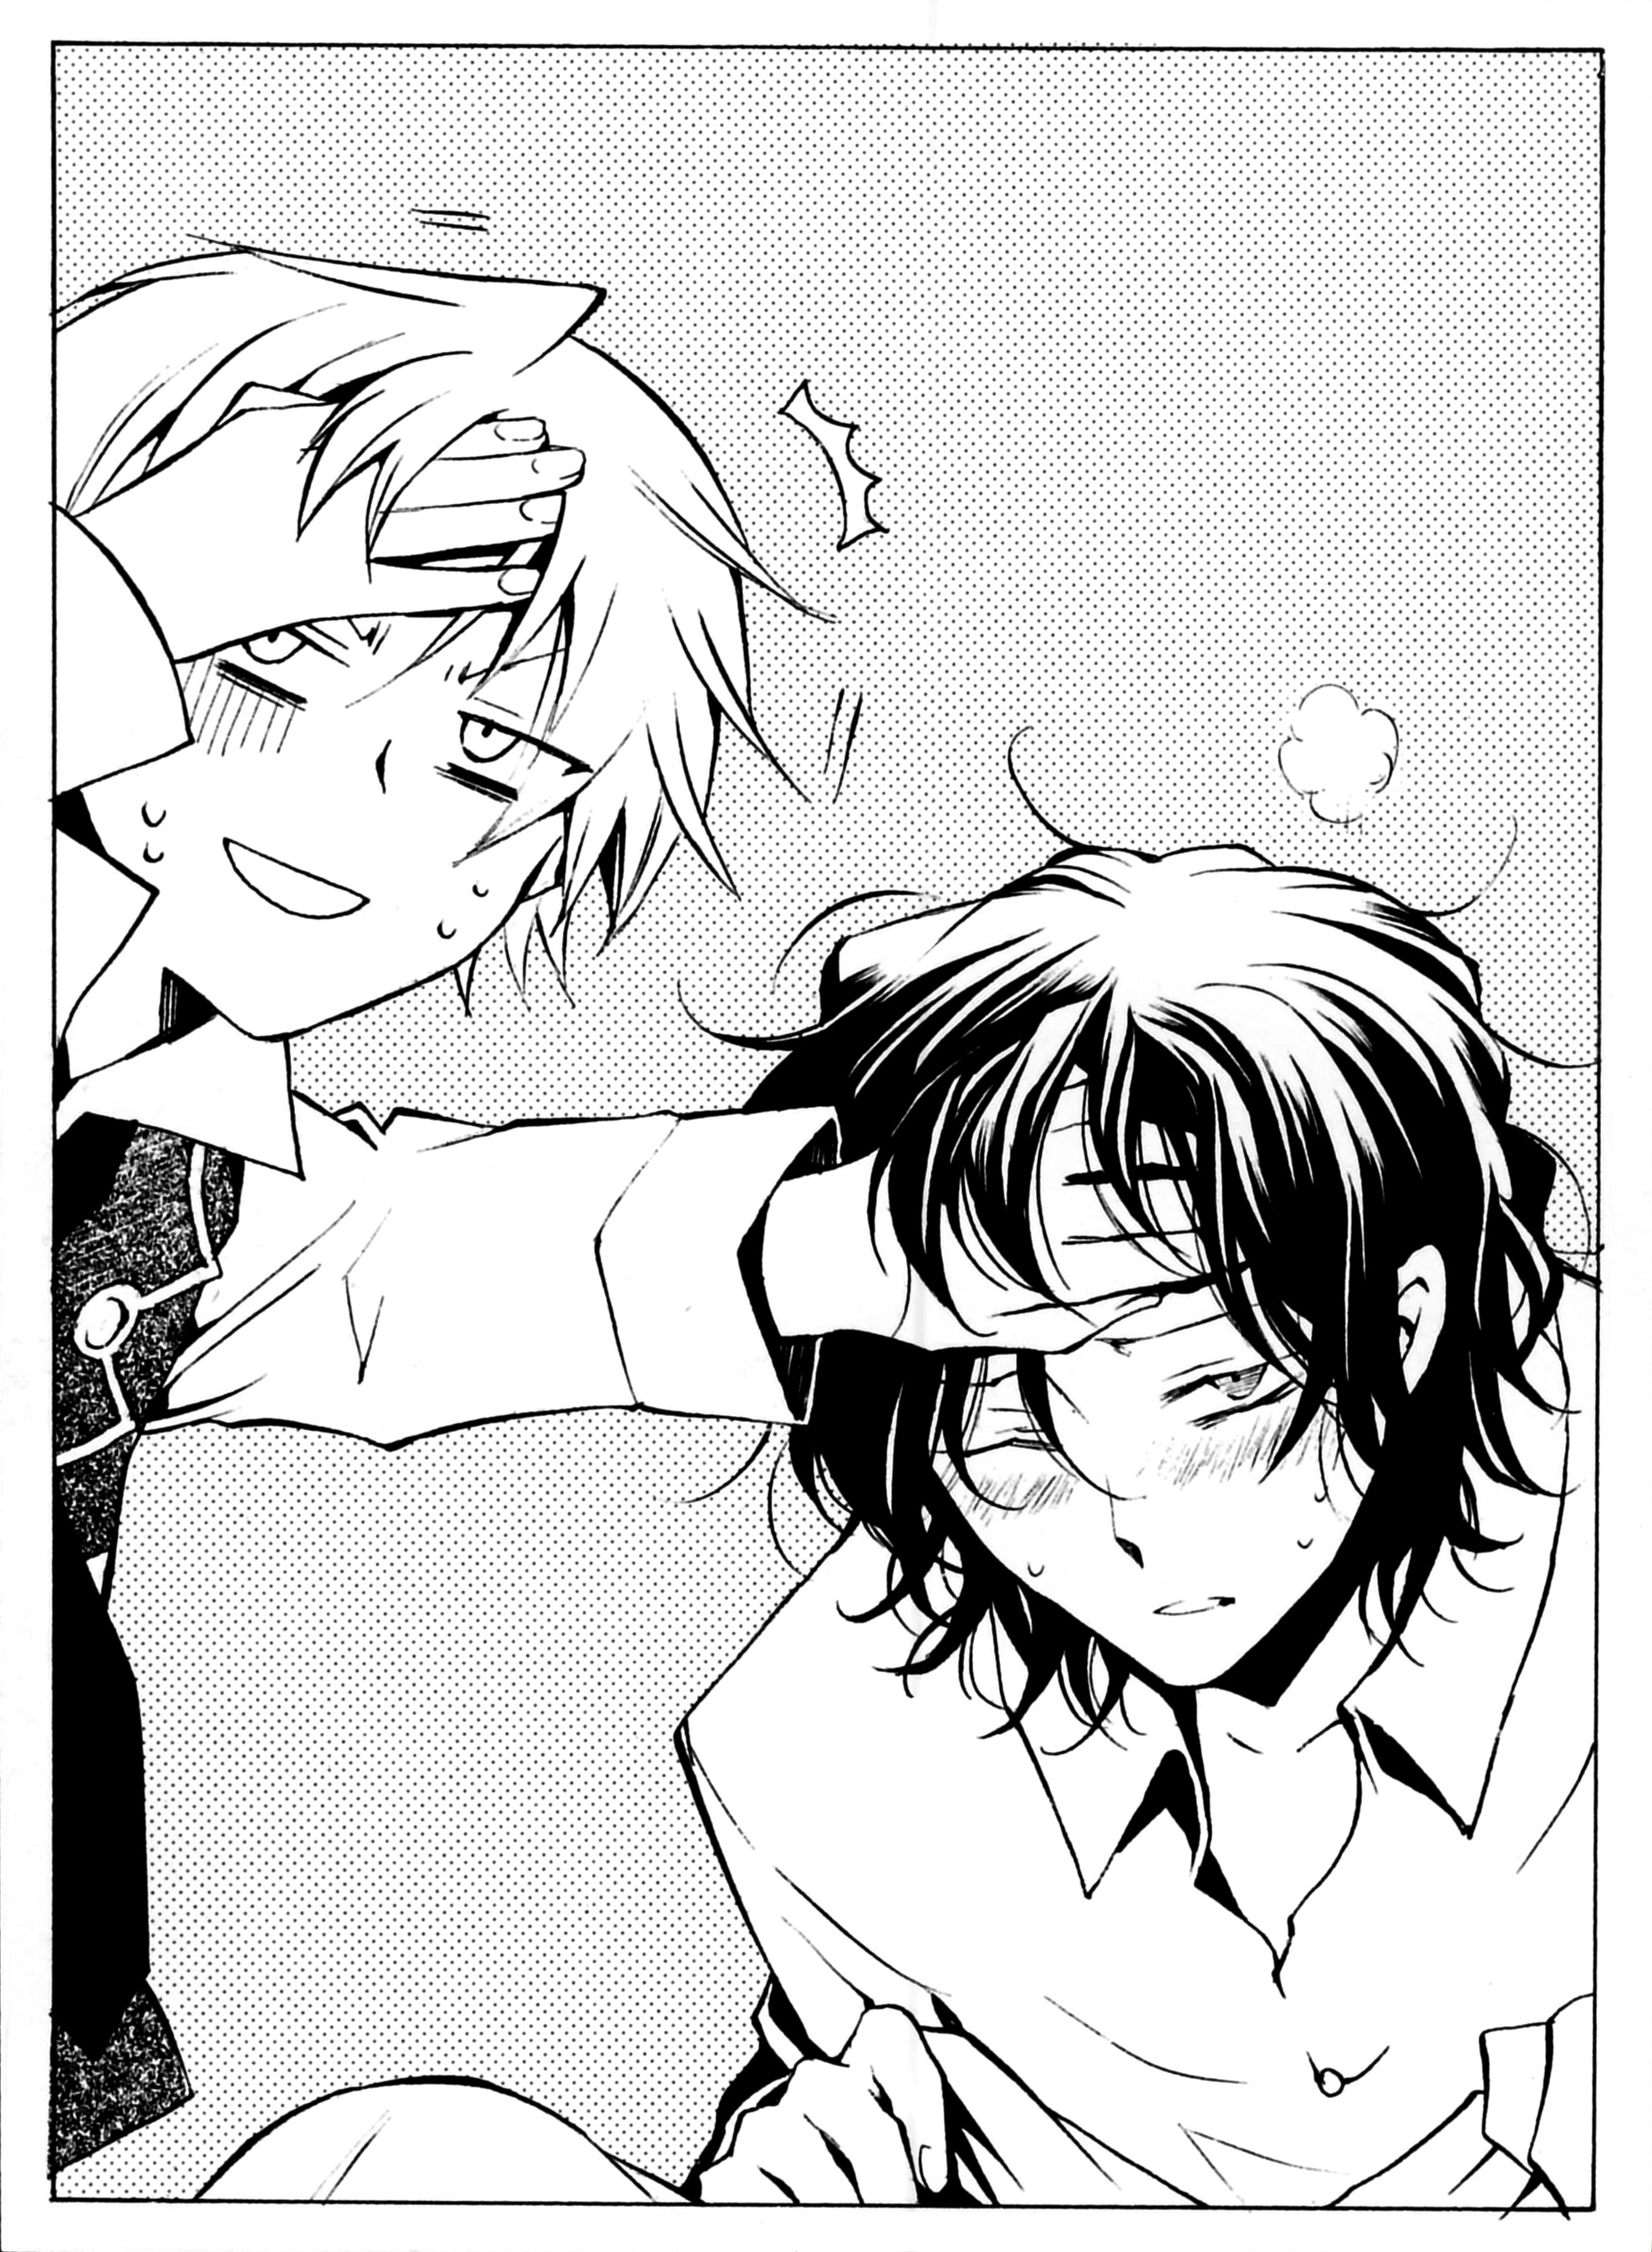 Sick - Zerochan Anime Image Board